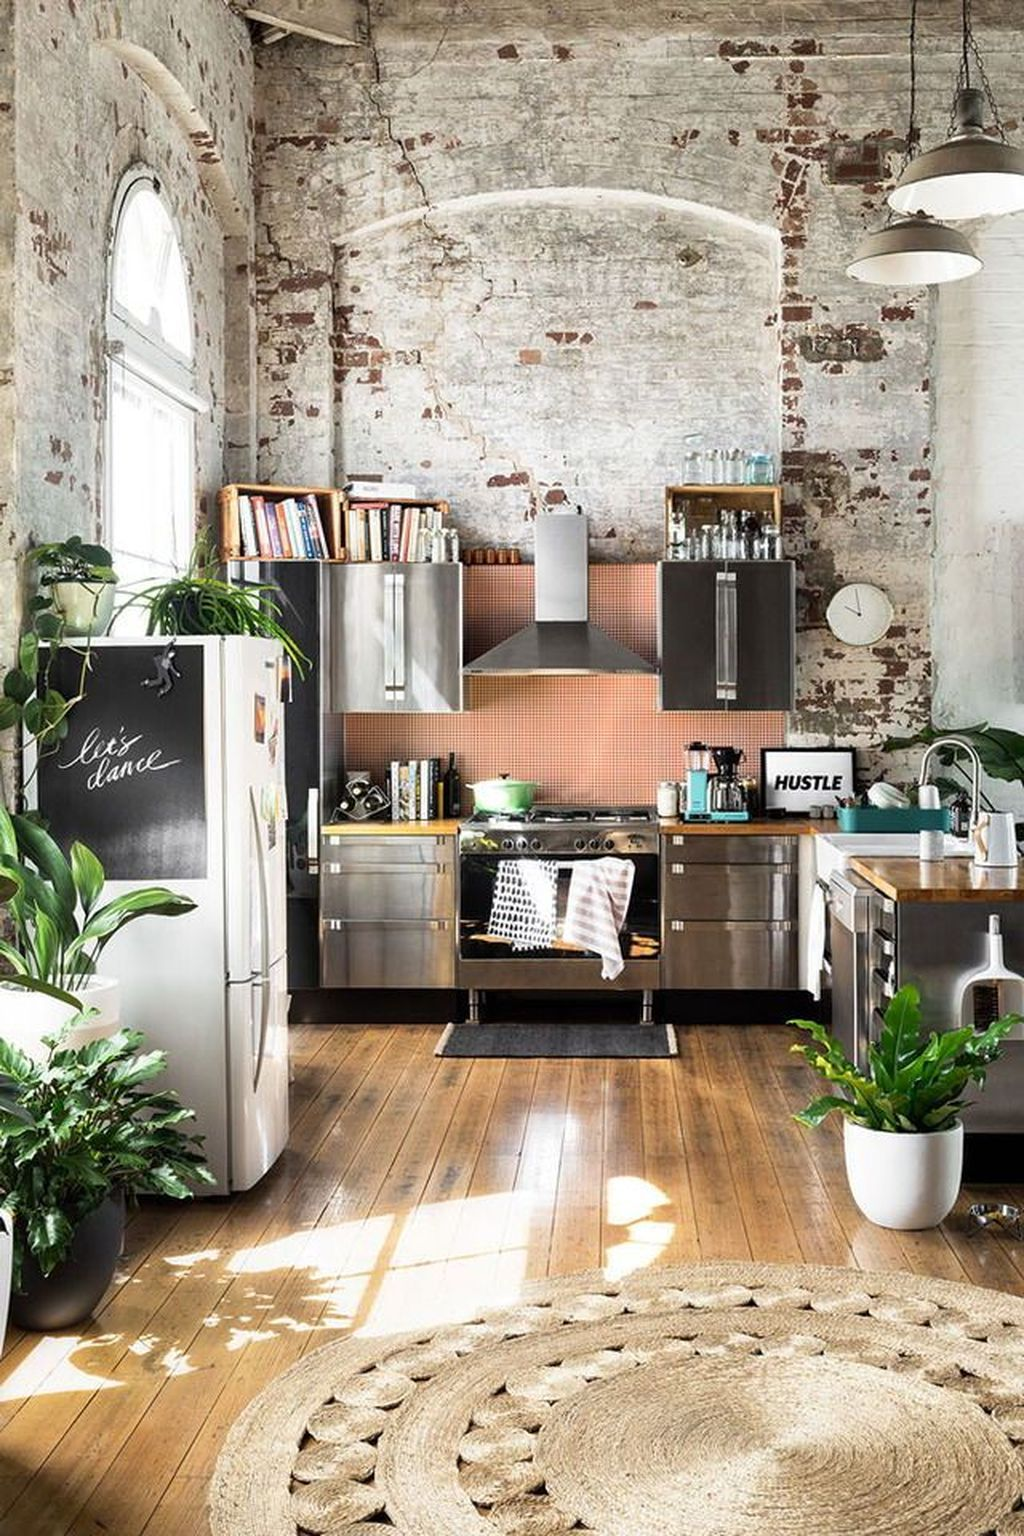 Case E Stili Design 41 amazing kitchens design ideas with a brick wall | stili